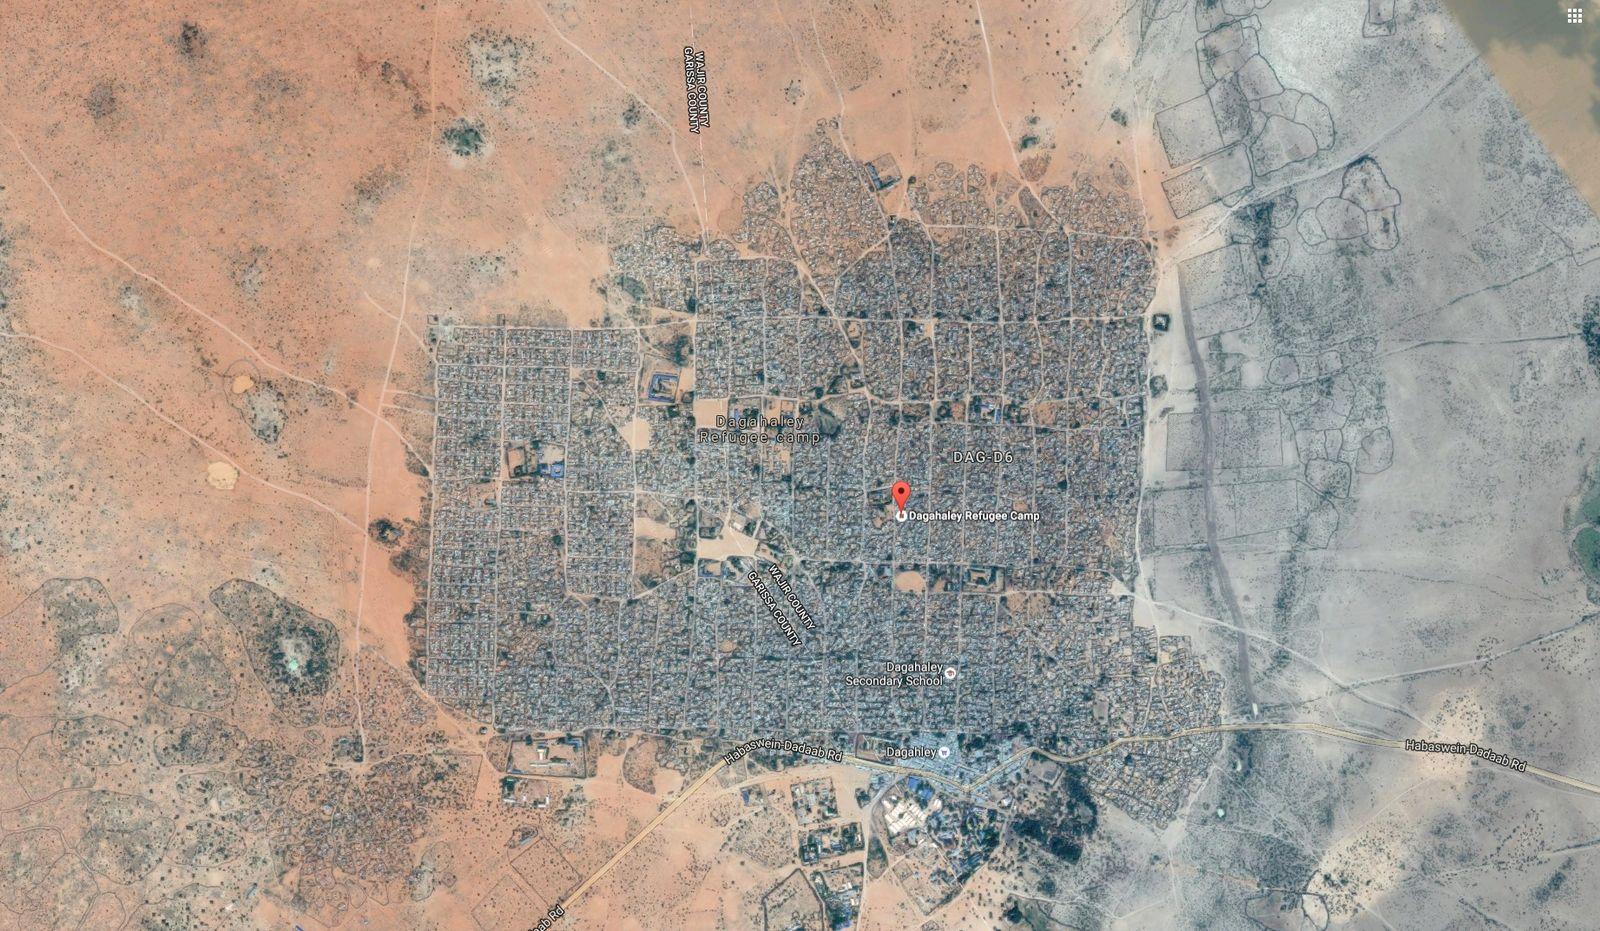 EINMALIGE VERWENDUNG UHNCR/ Dagahaley/ Kenia